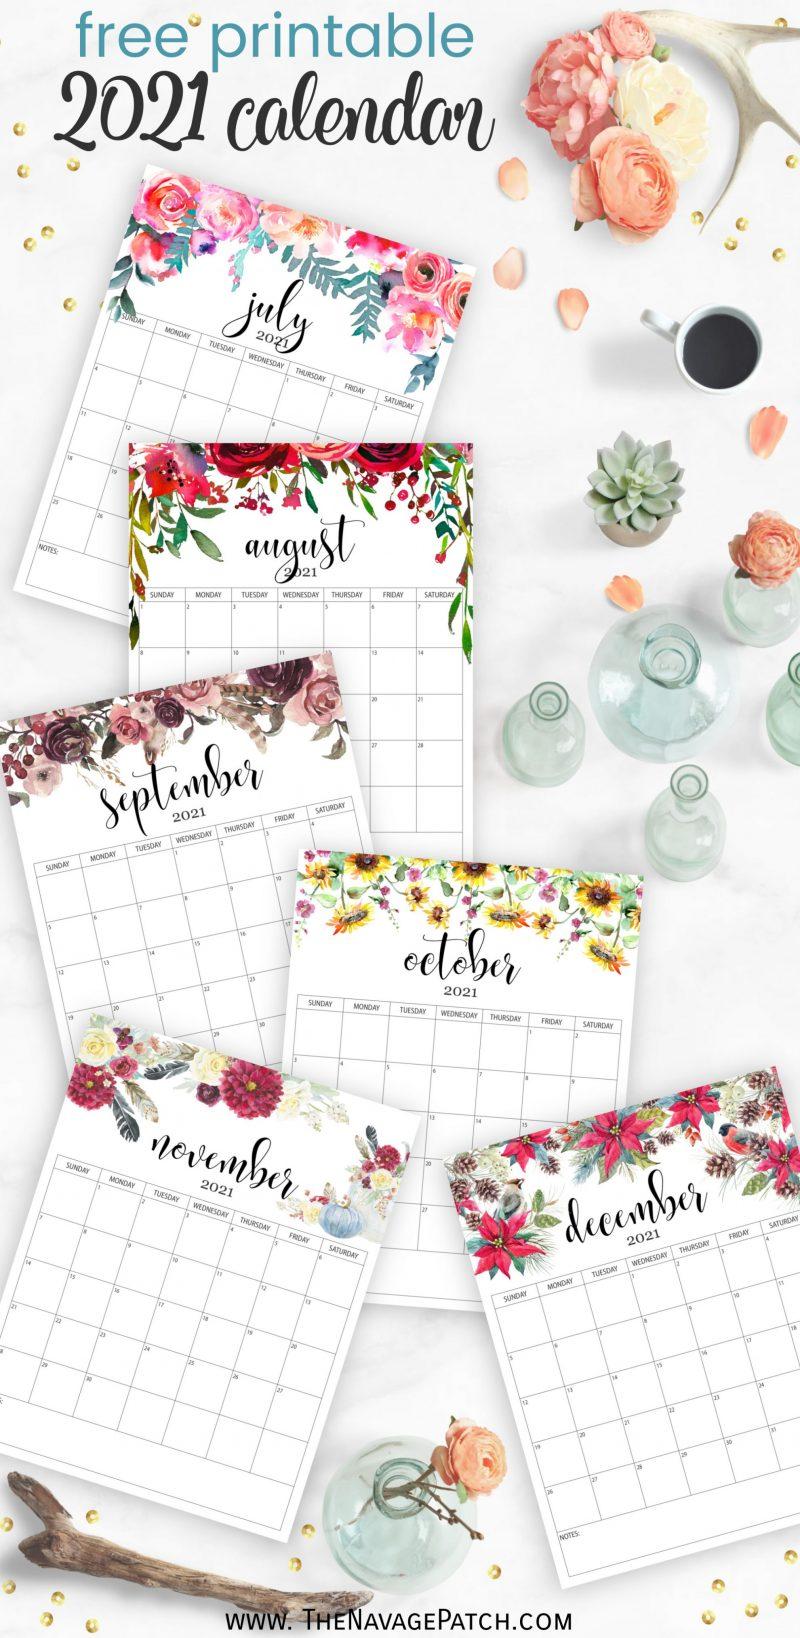 Free Printable Floral Calendar 2021 - TheNavagePatch.com